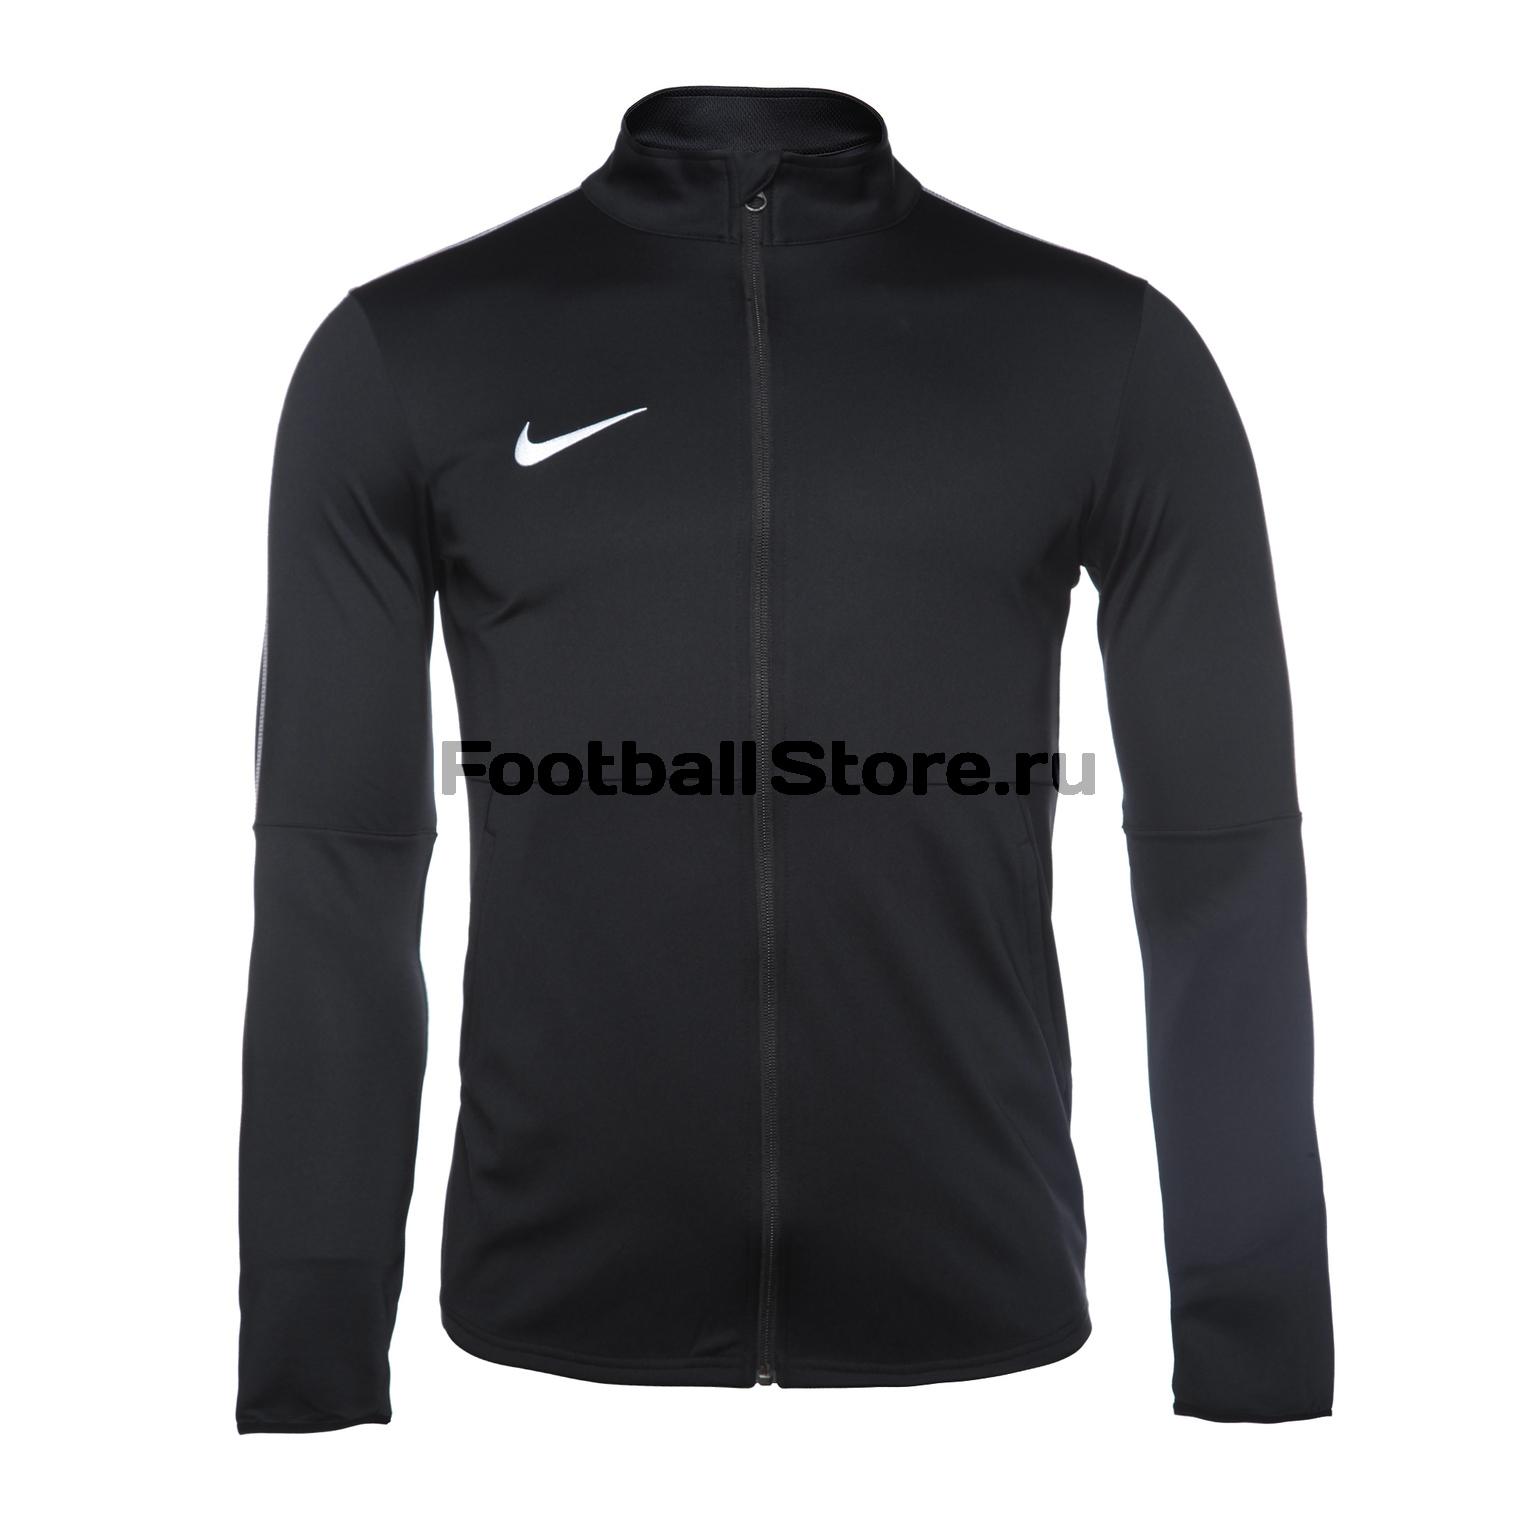 Фото - Олимпийка Nike Dry Park18 AA2059-010 куртка ветрозащитная nike dry park18 rn jkt aa2090 010 sr